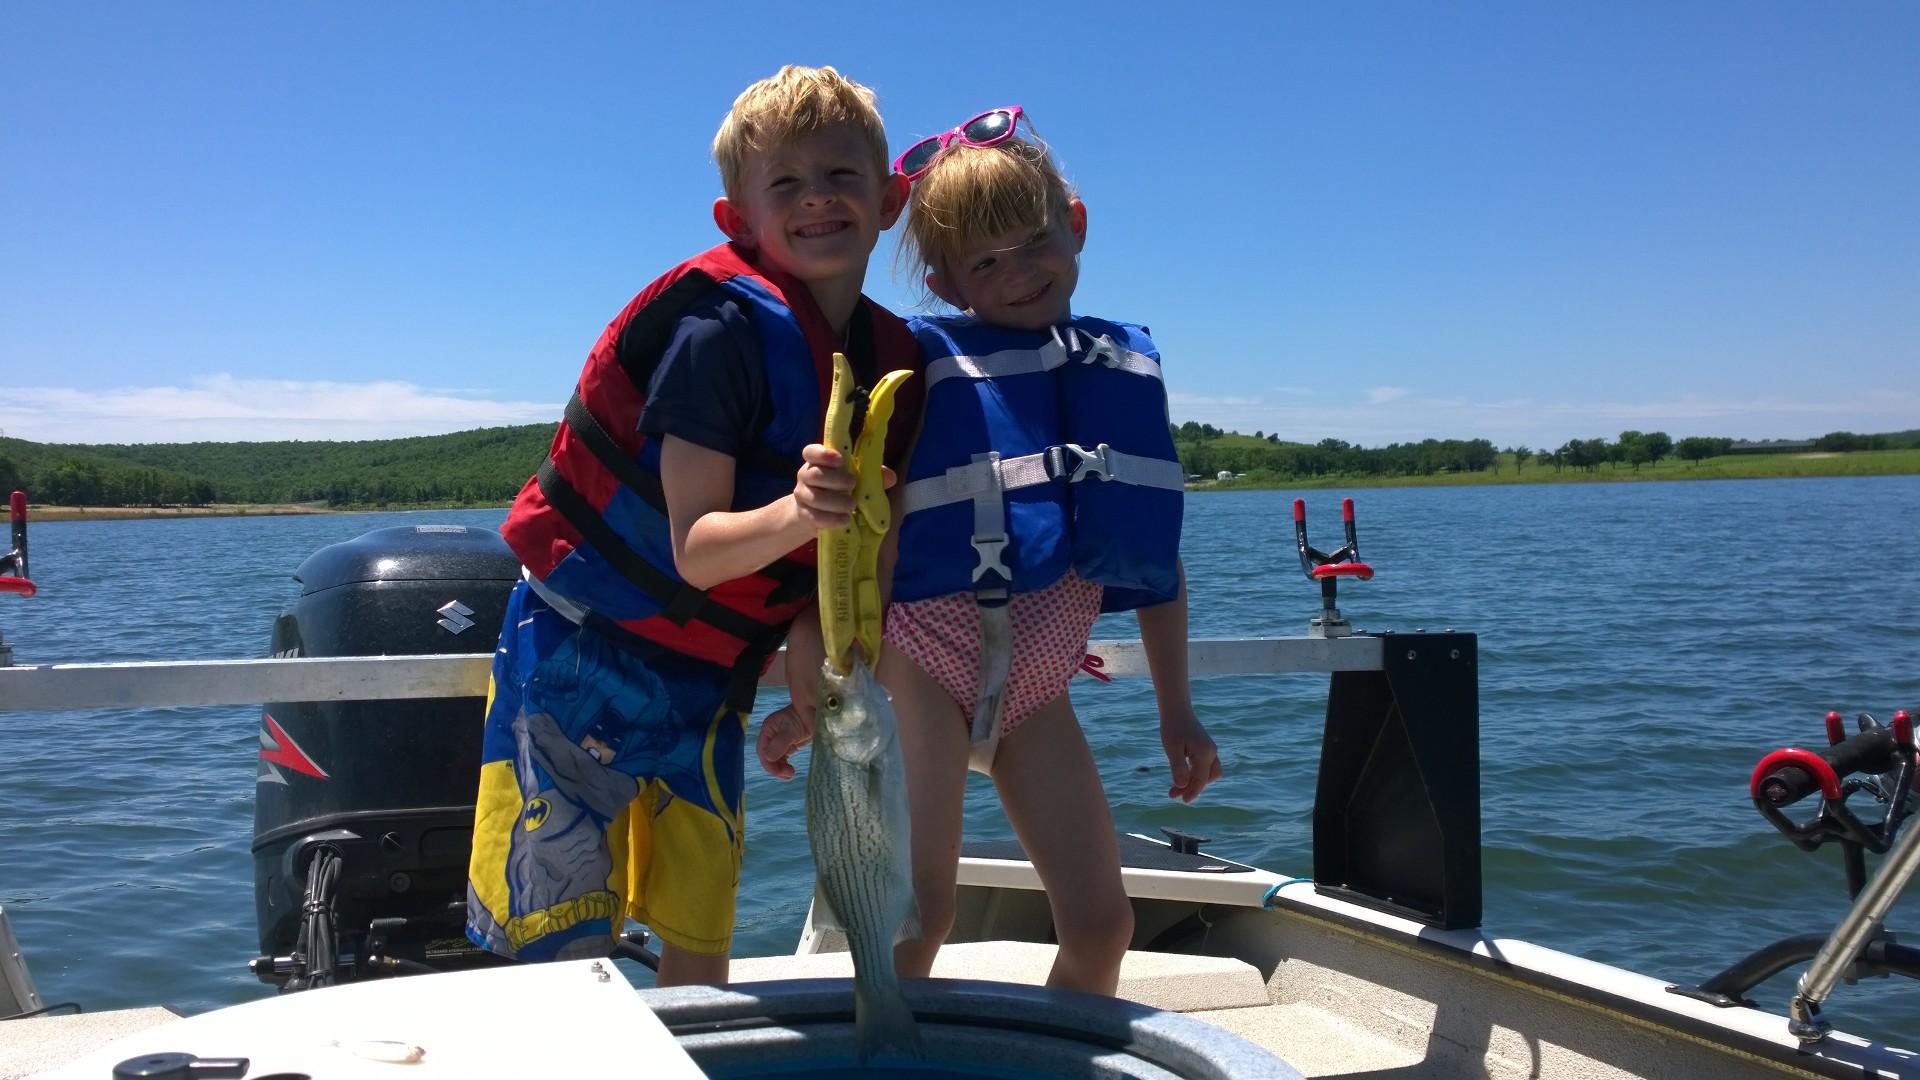 June 8th 2015 skiatook lake fishing for hybrid striper for Skiatook lake fishing report